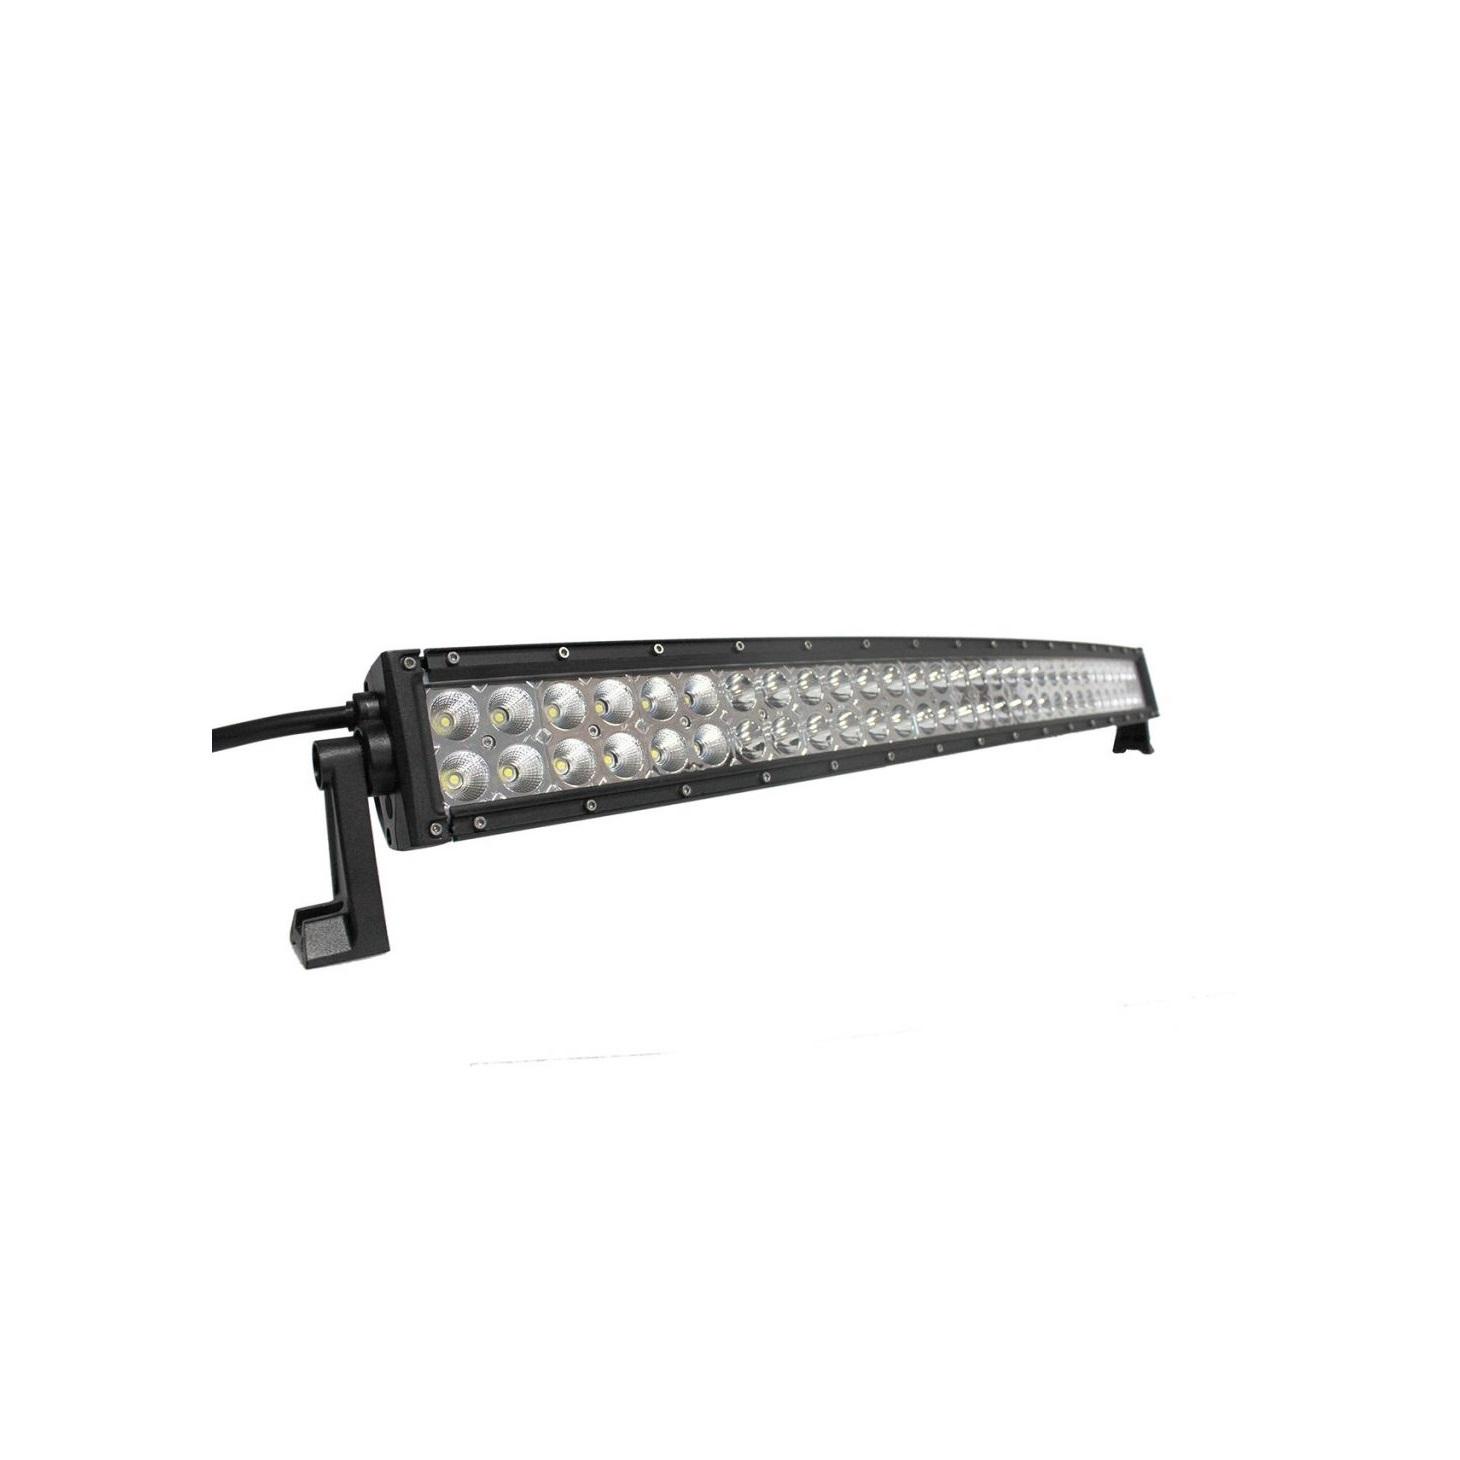 SHARK LED LIGHT BAR, CURVED, 30, 180W, R 810 MM